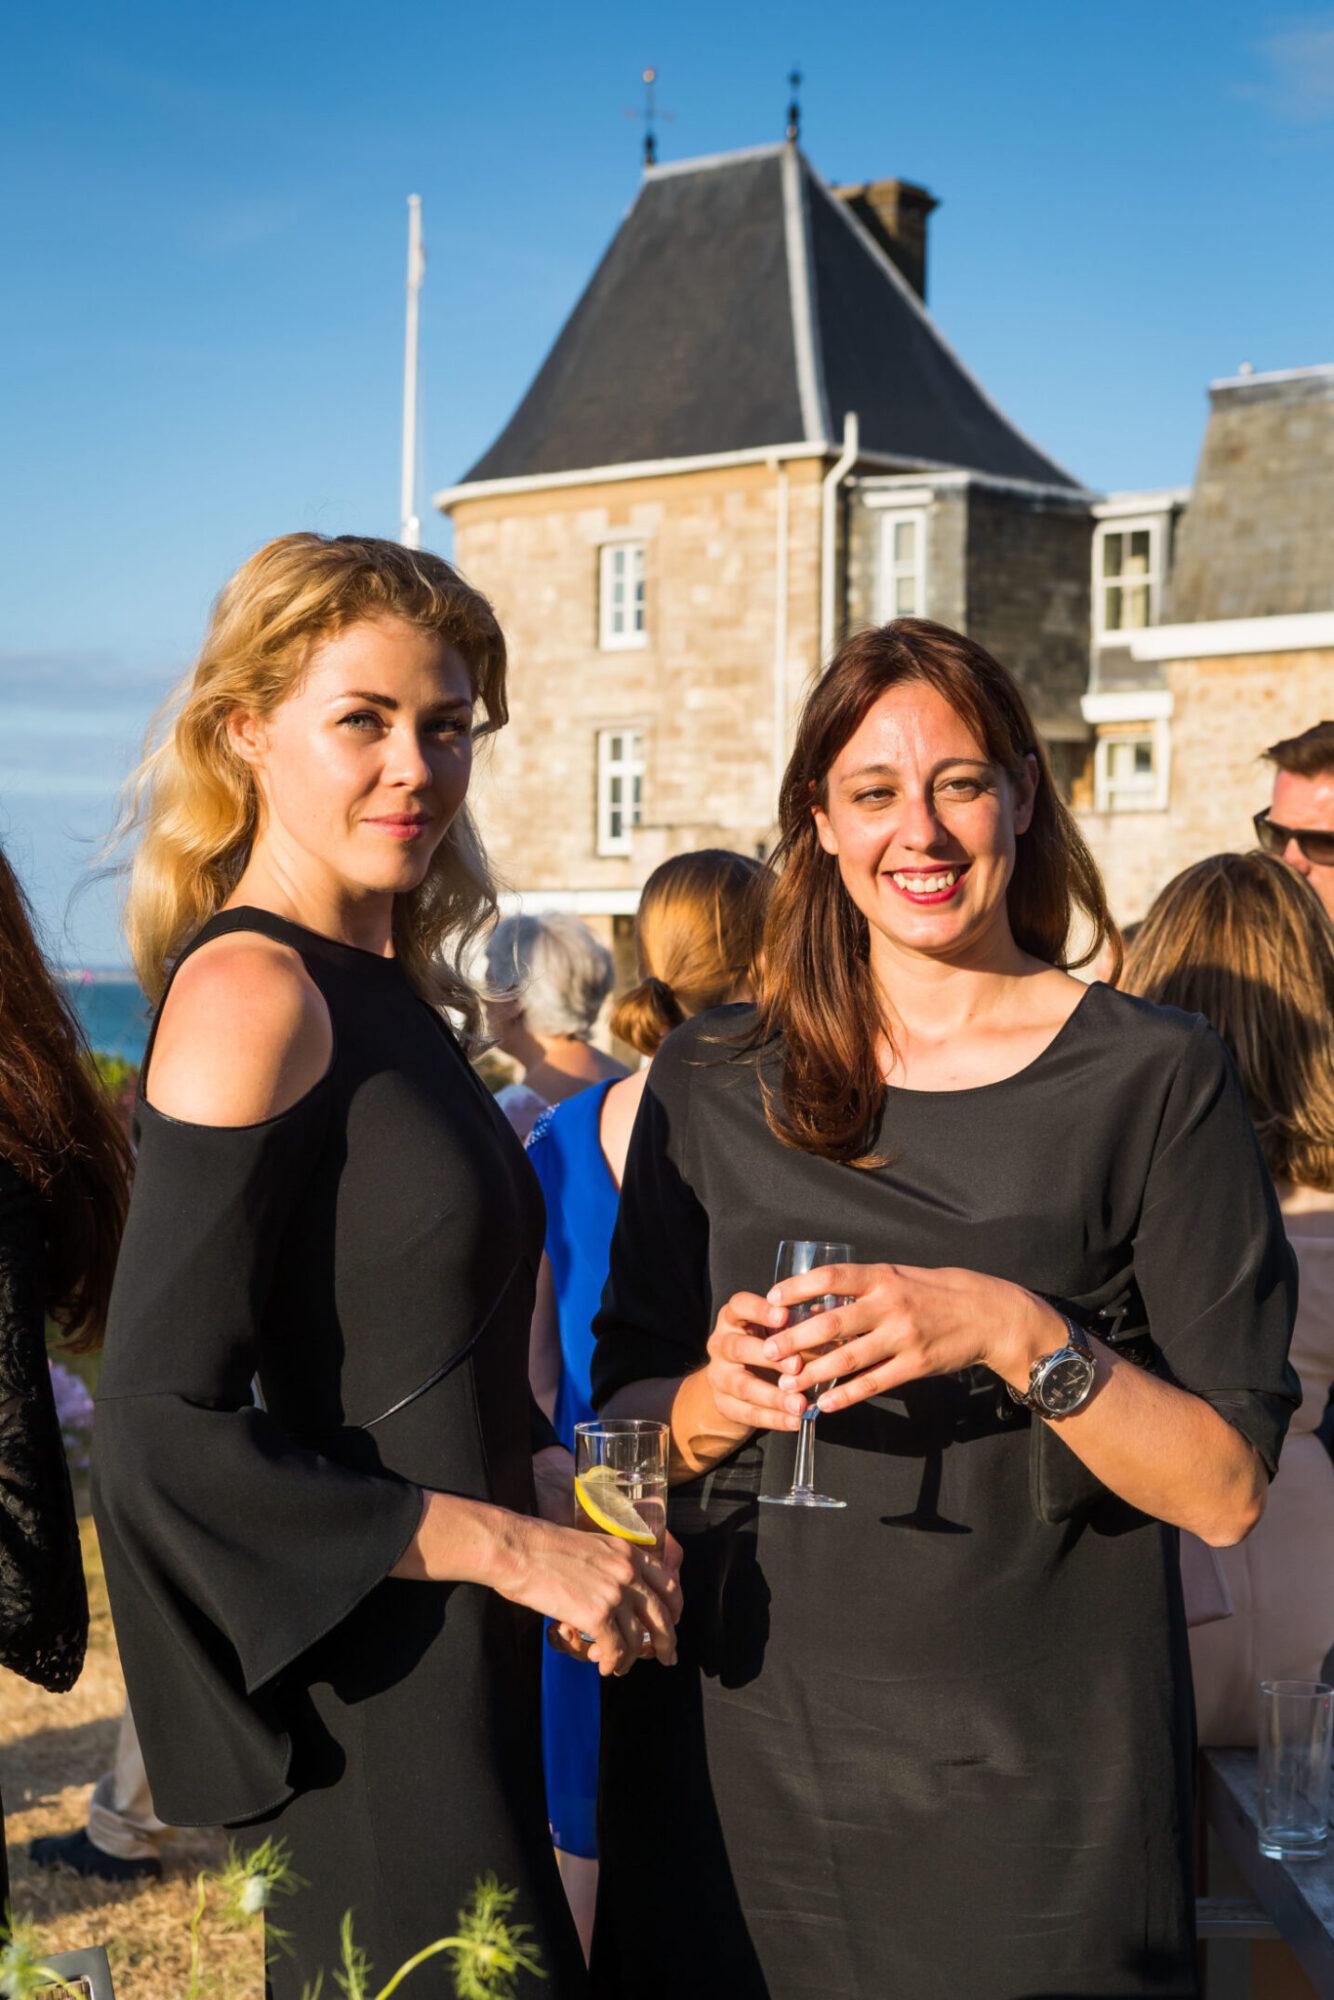 Kristina Moskalenko at the Panerai British Classic Week 2018 Photo: Guido Cantini / Panerai